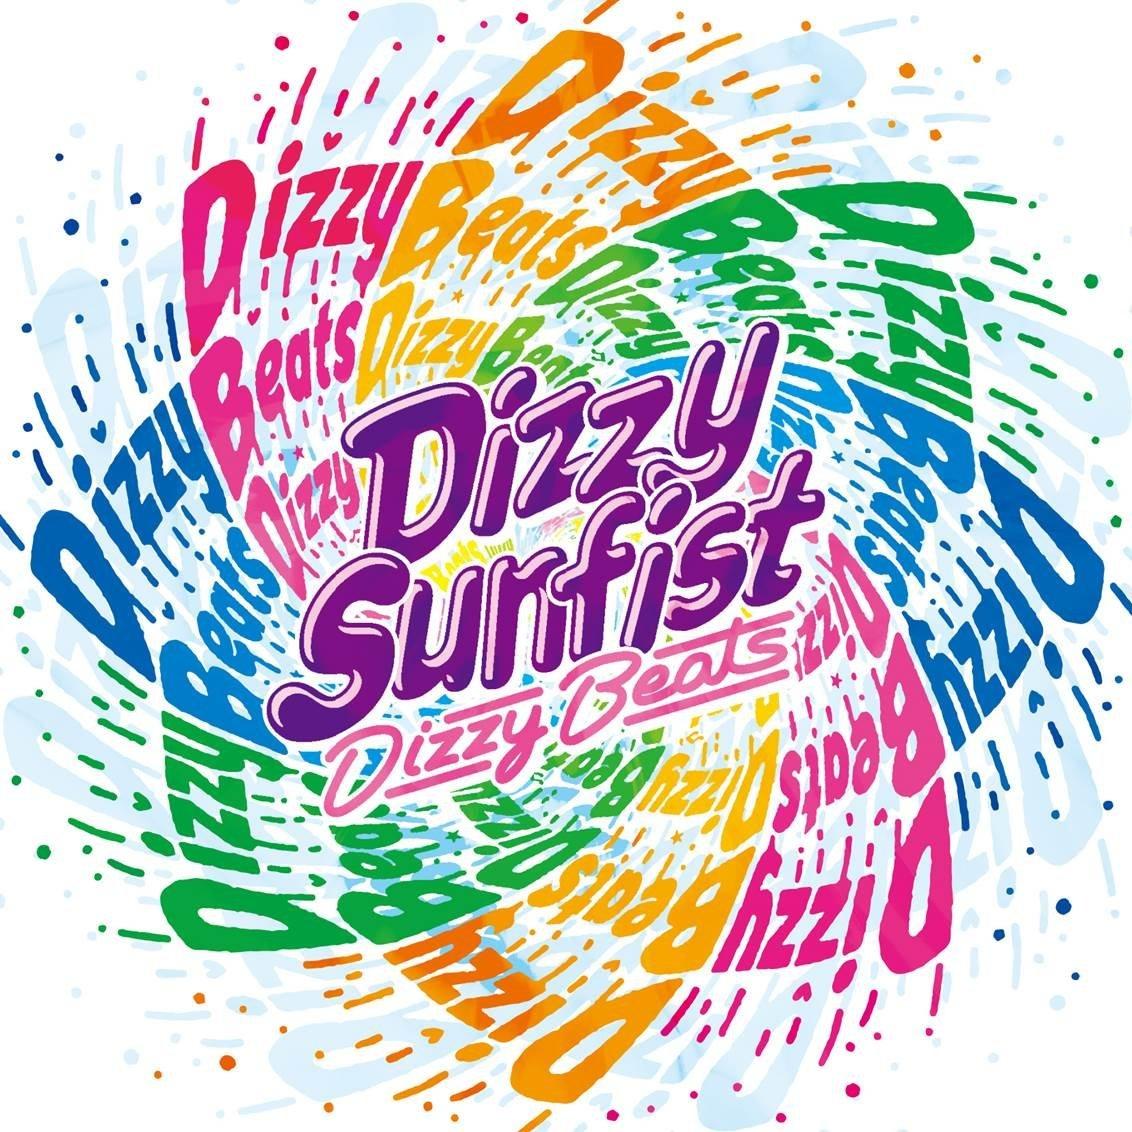 Dizzy Beats [ Dizzy Sunfist ]